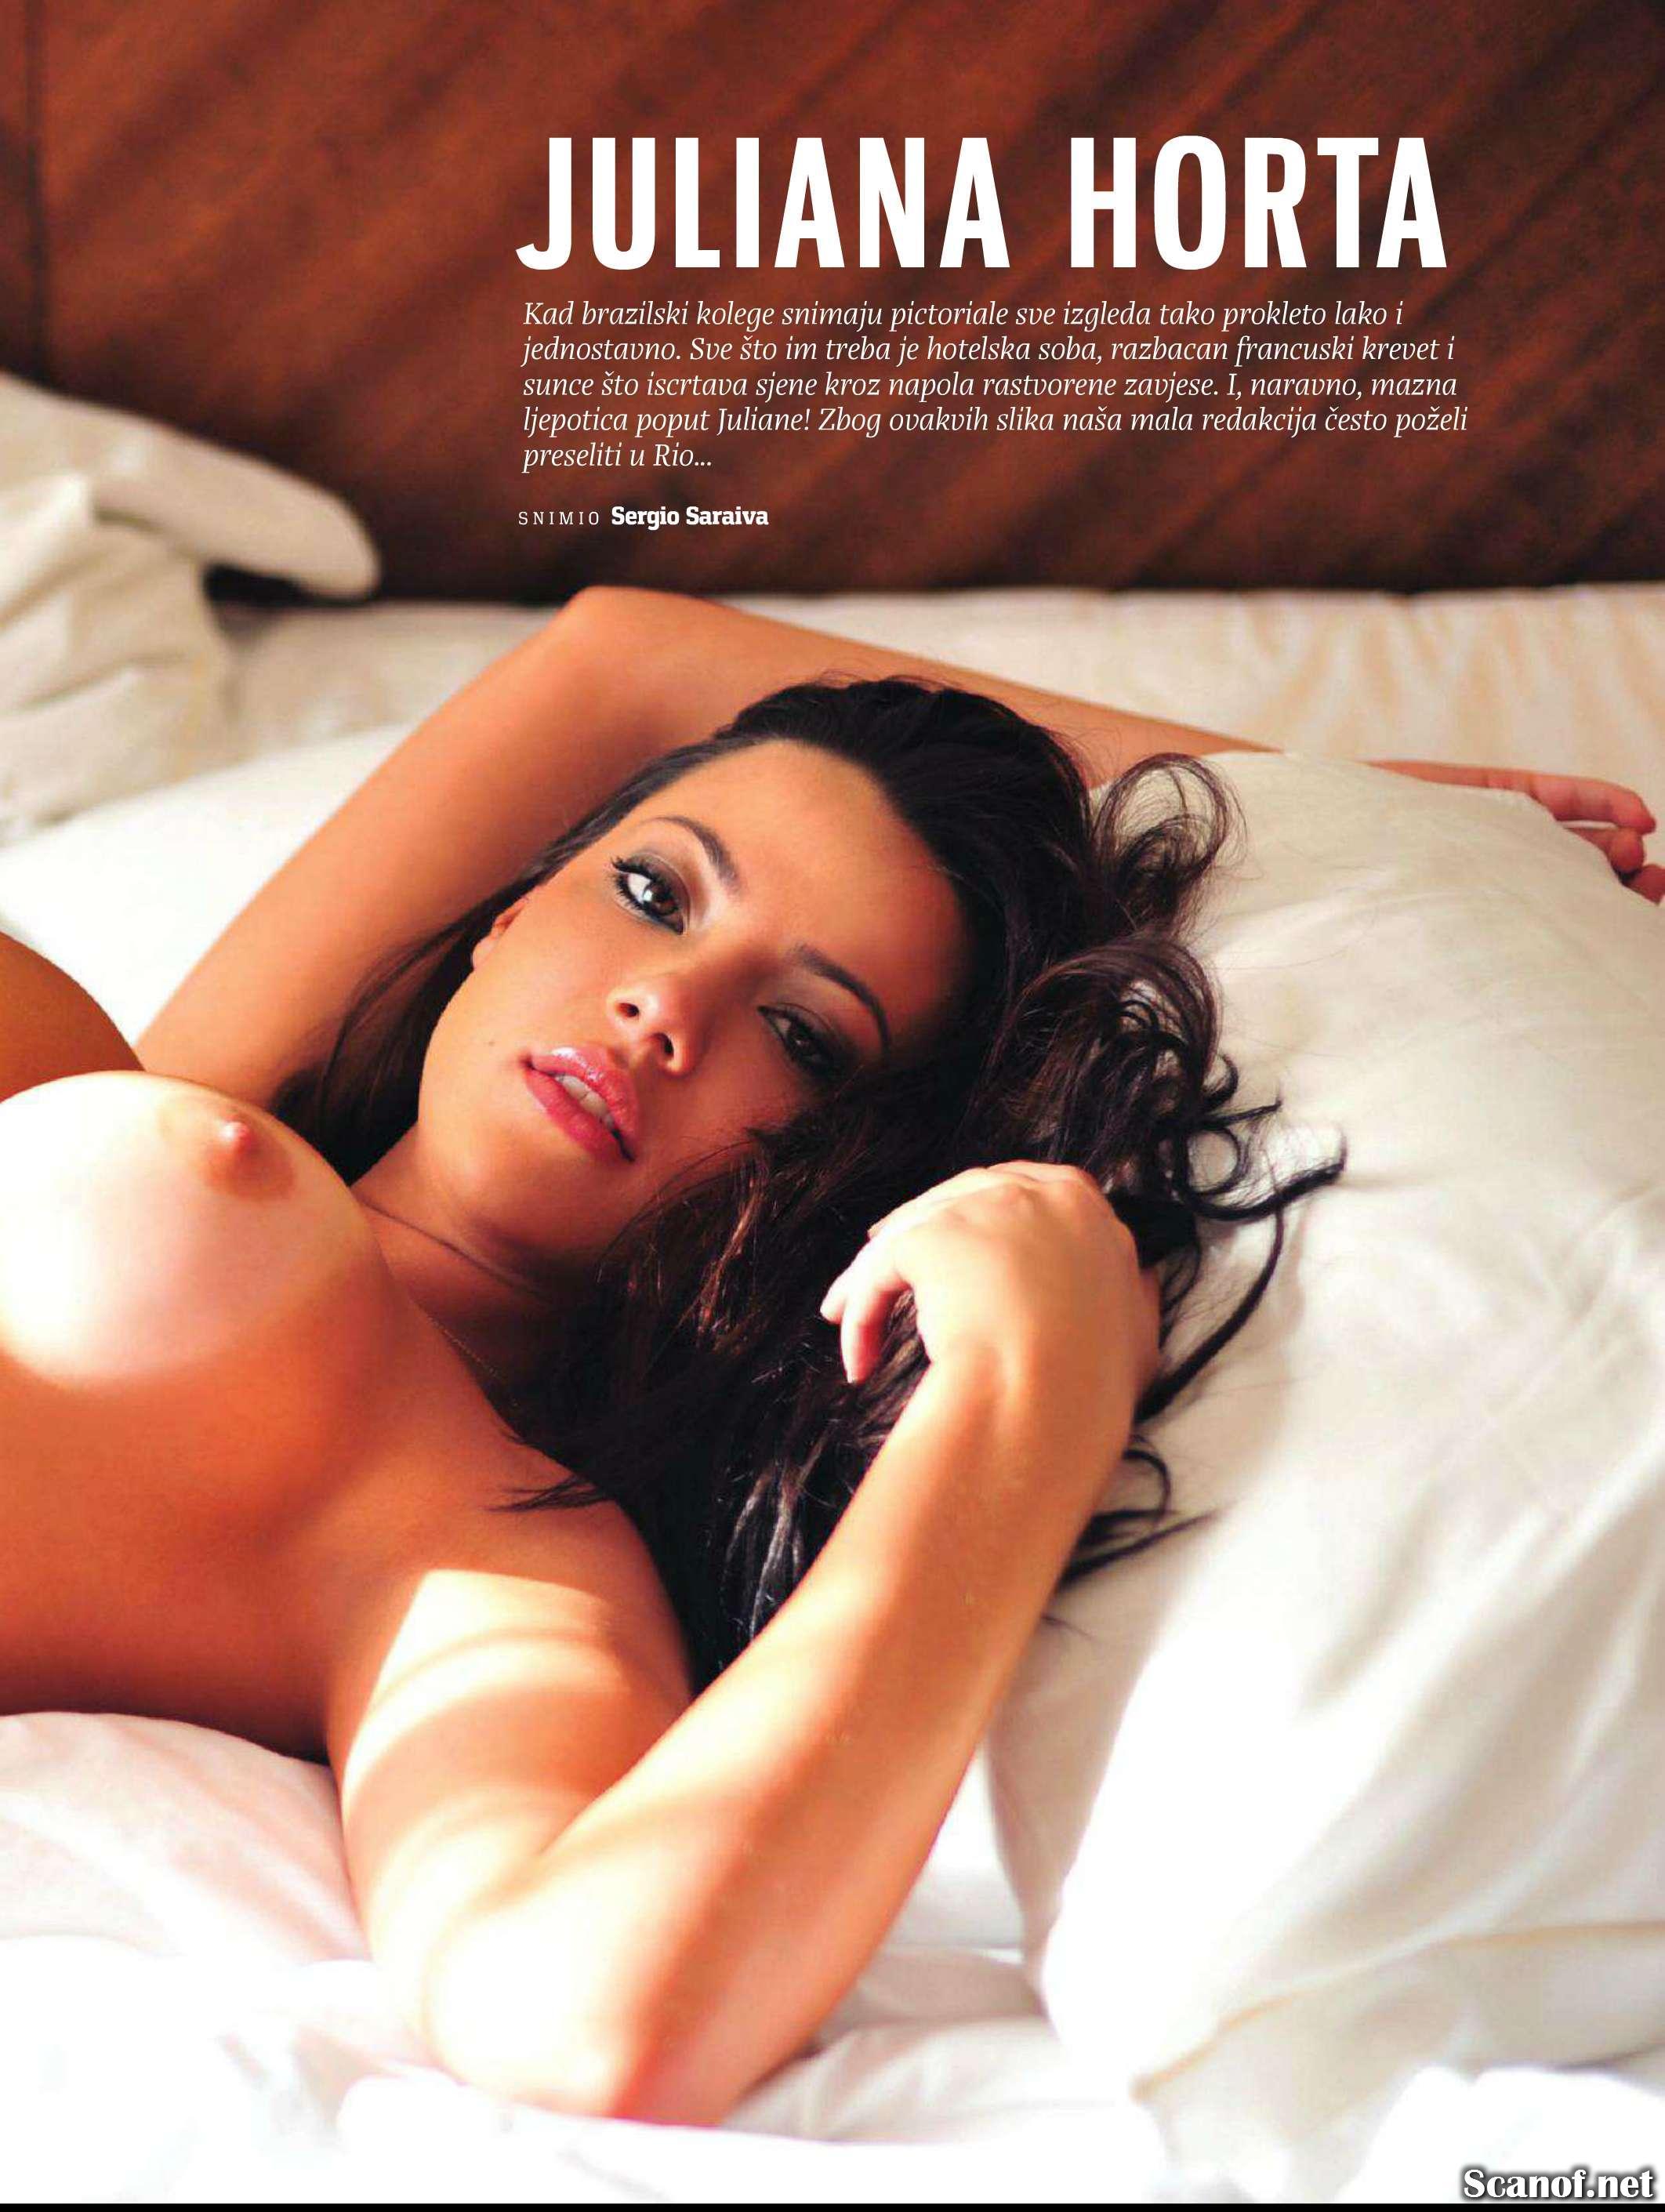 438299621_Playboy_2013_06_Croatia_Scanof.net_039_123_493lo.jpg